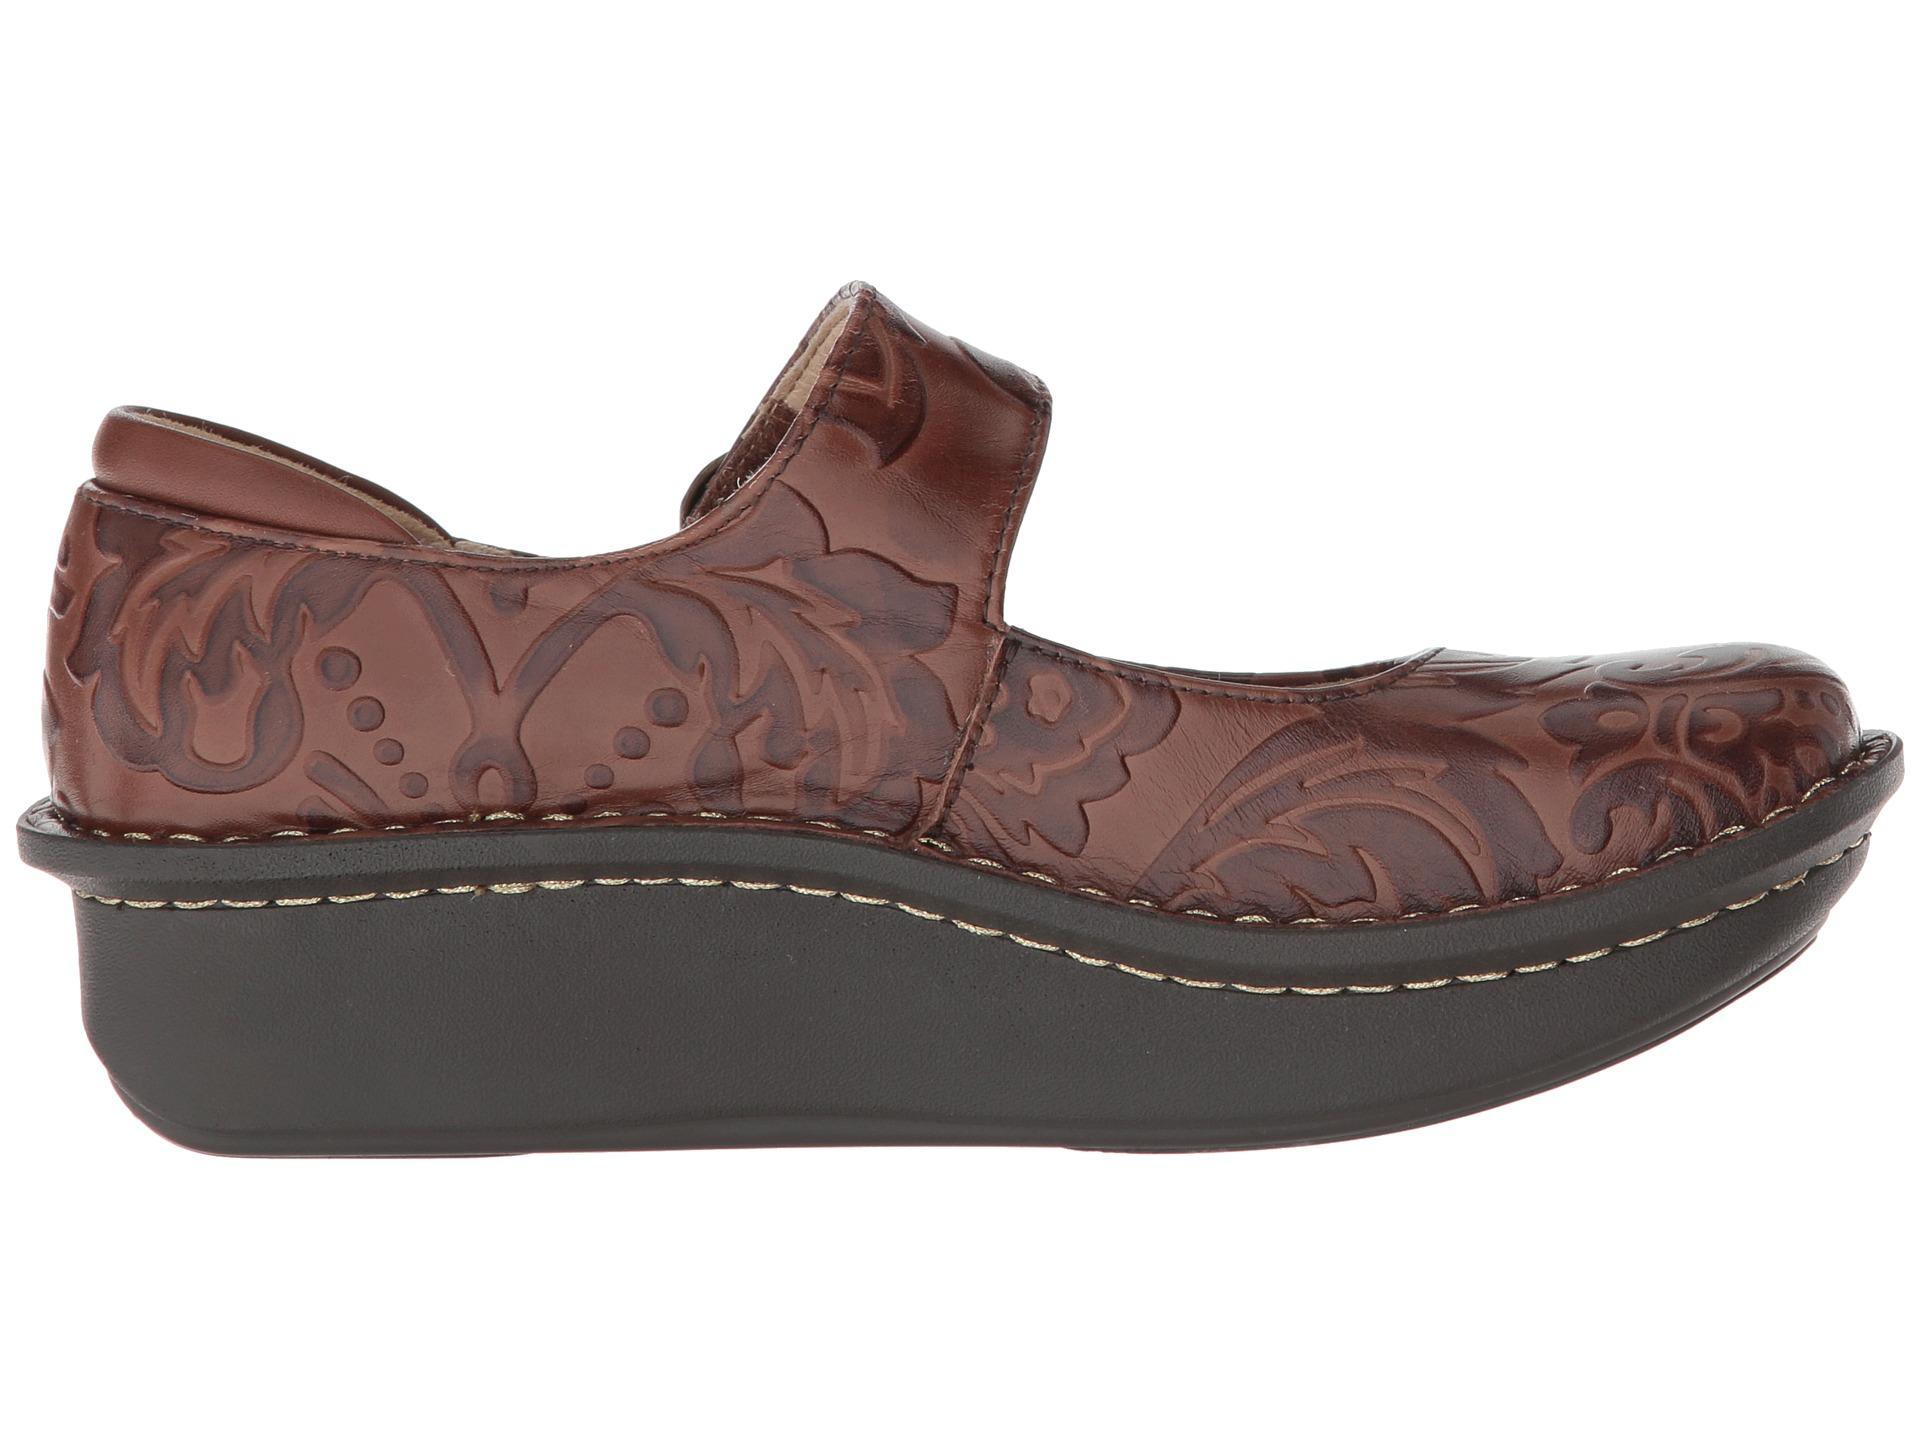 Alegria Paloma Shoes On Sale